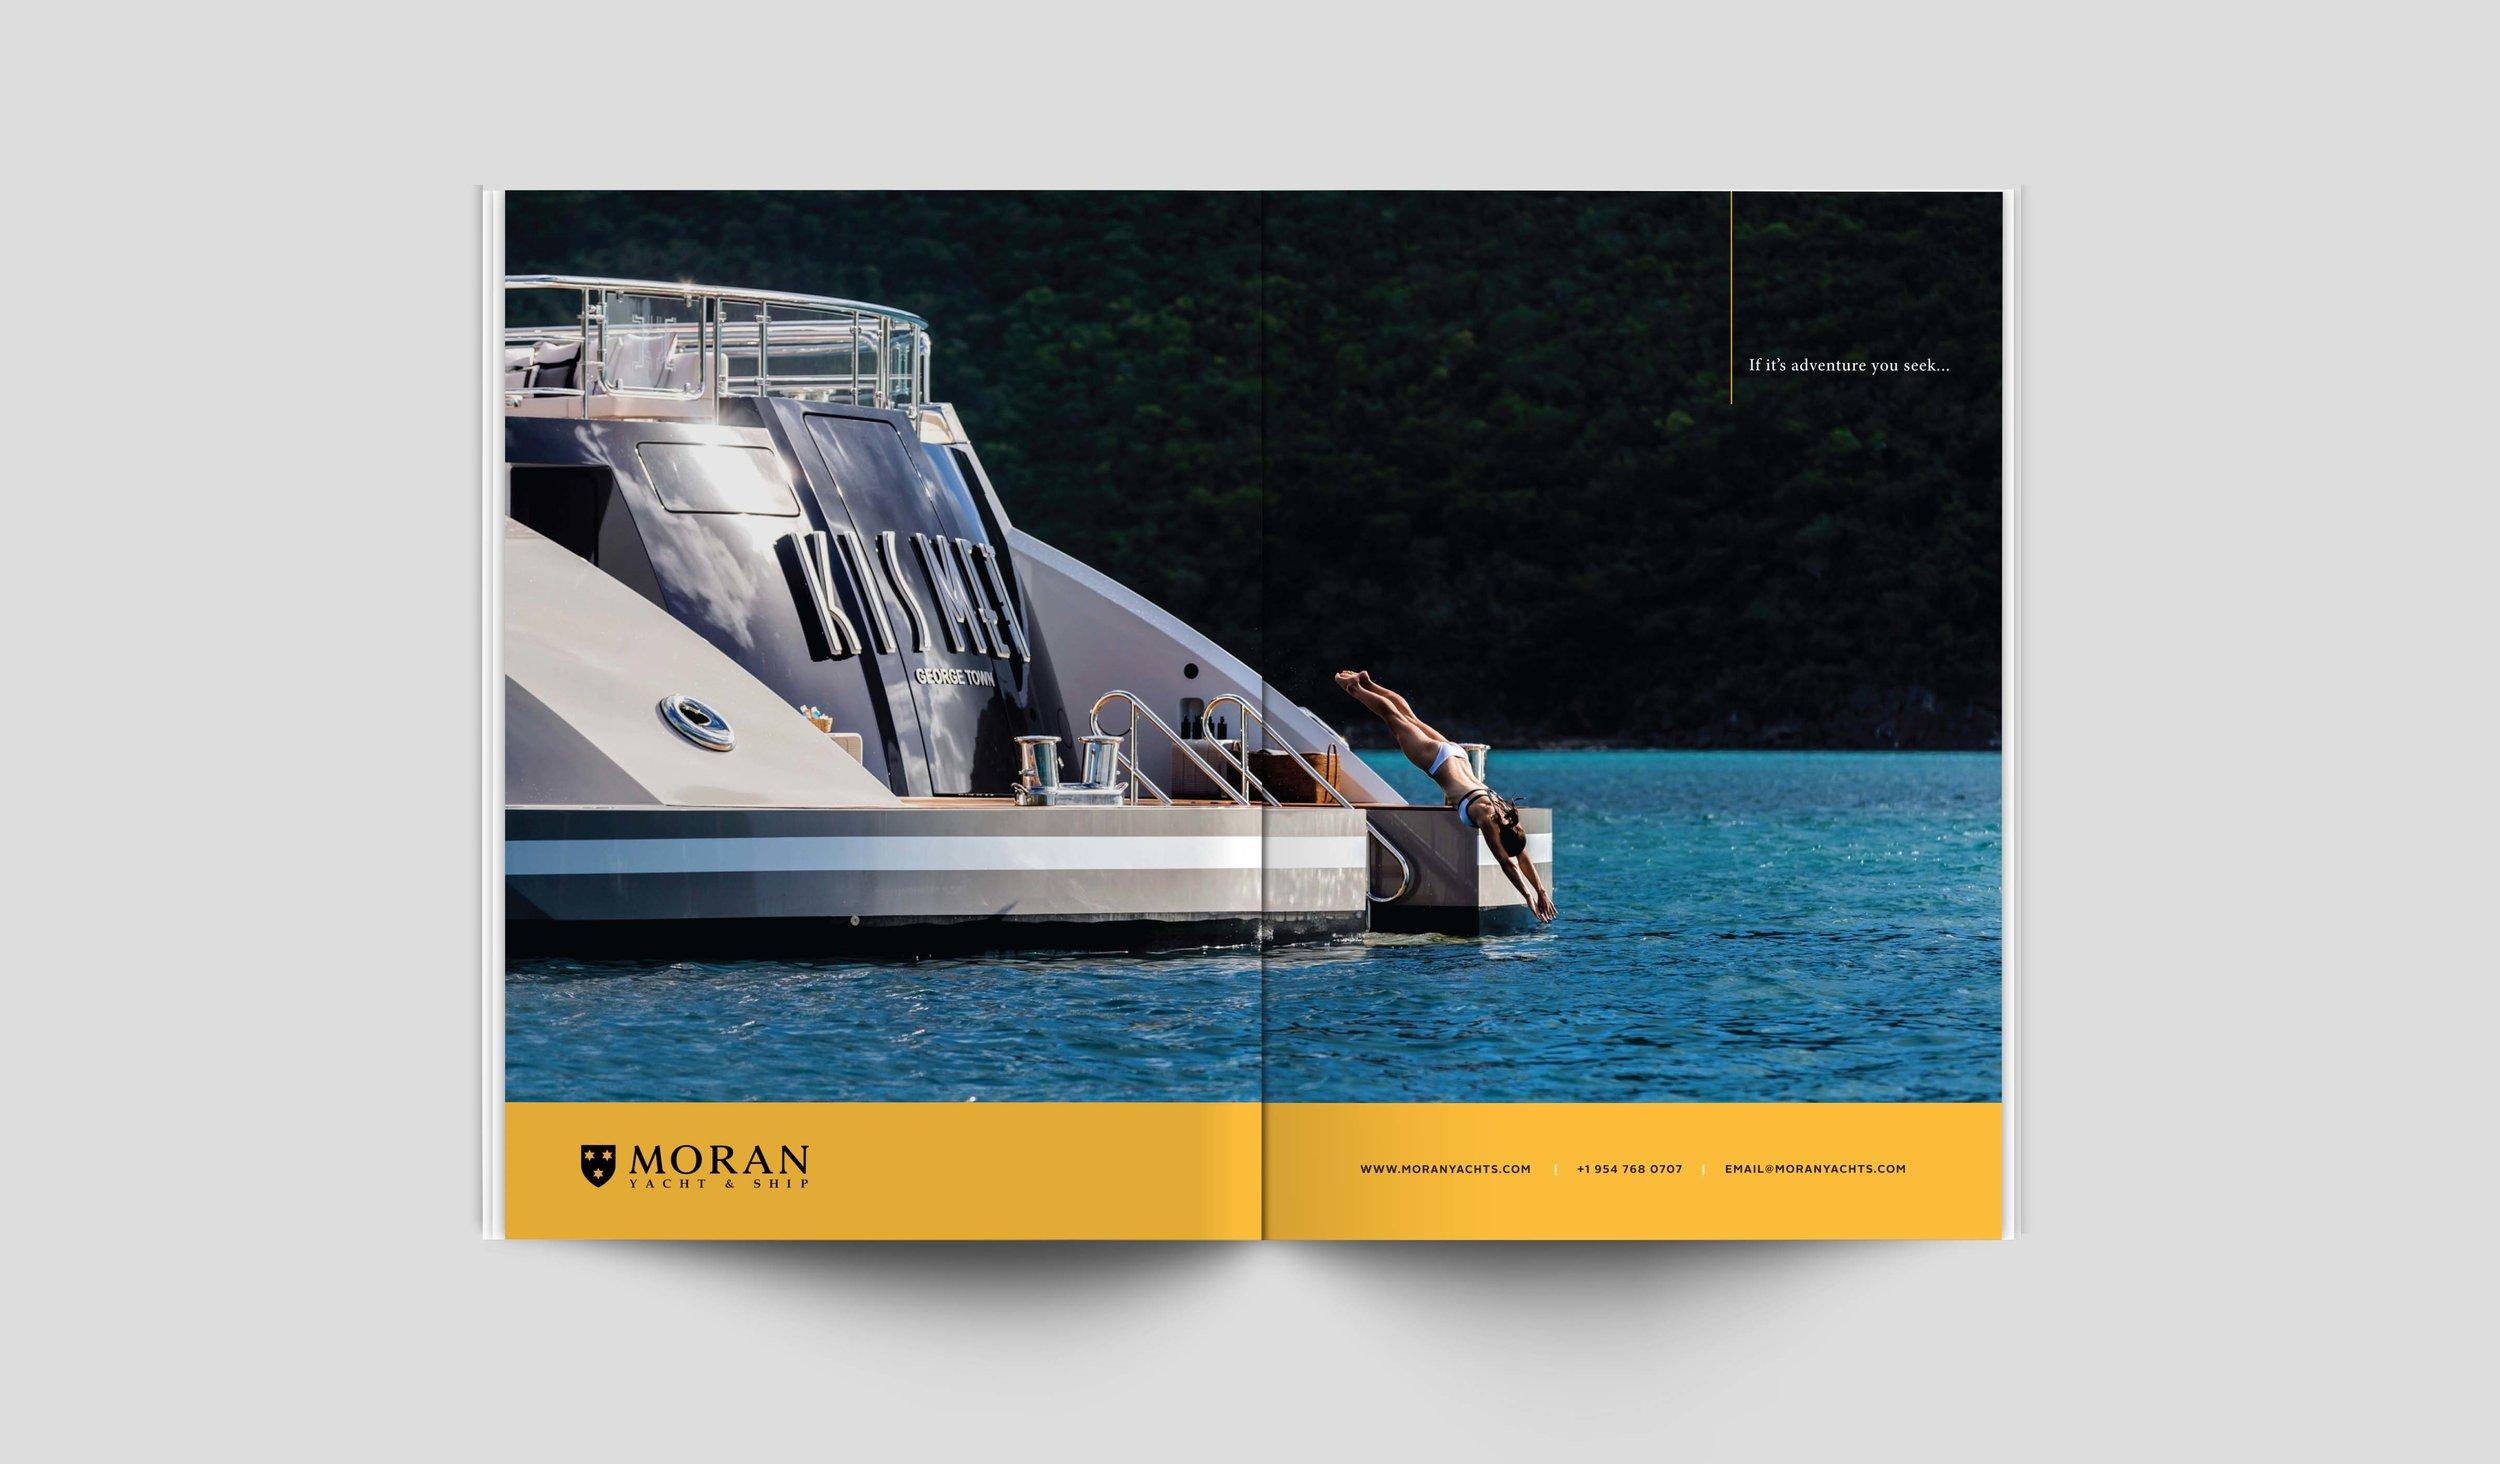 Moran_Company-Ad_Spread-5.jpg